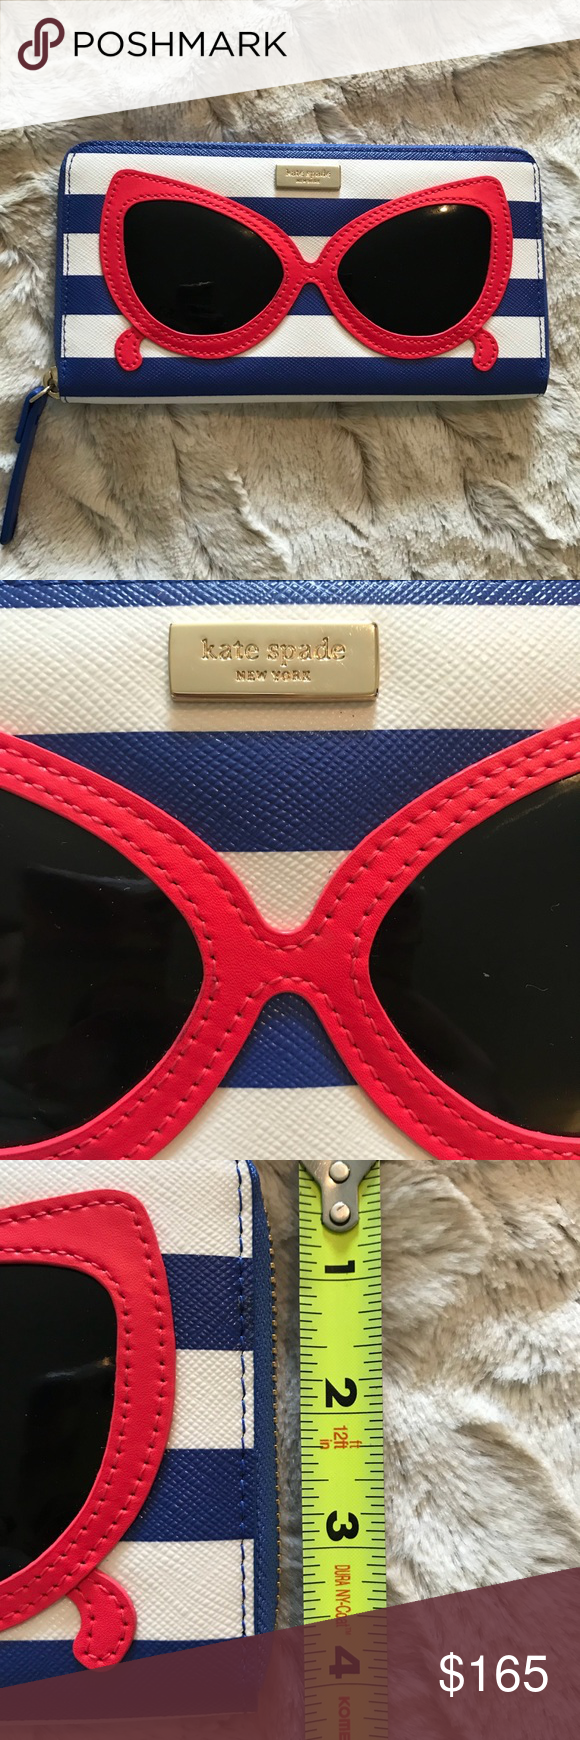 Luxury Kate Spade Make A Splash